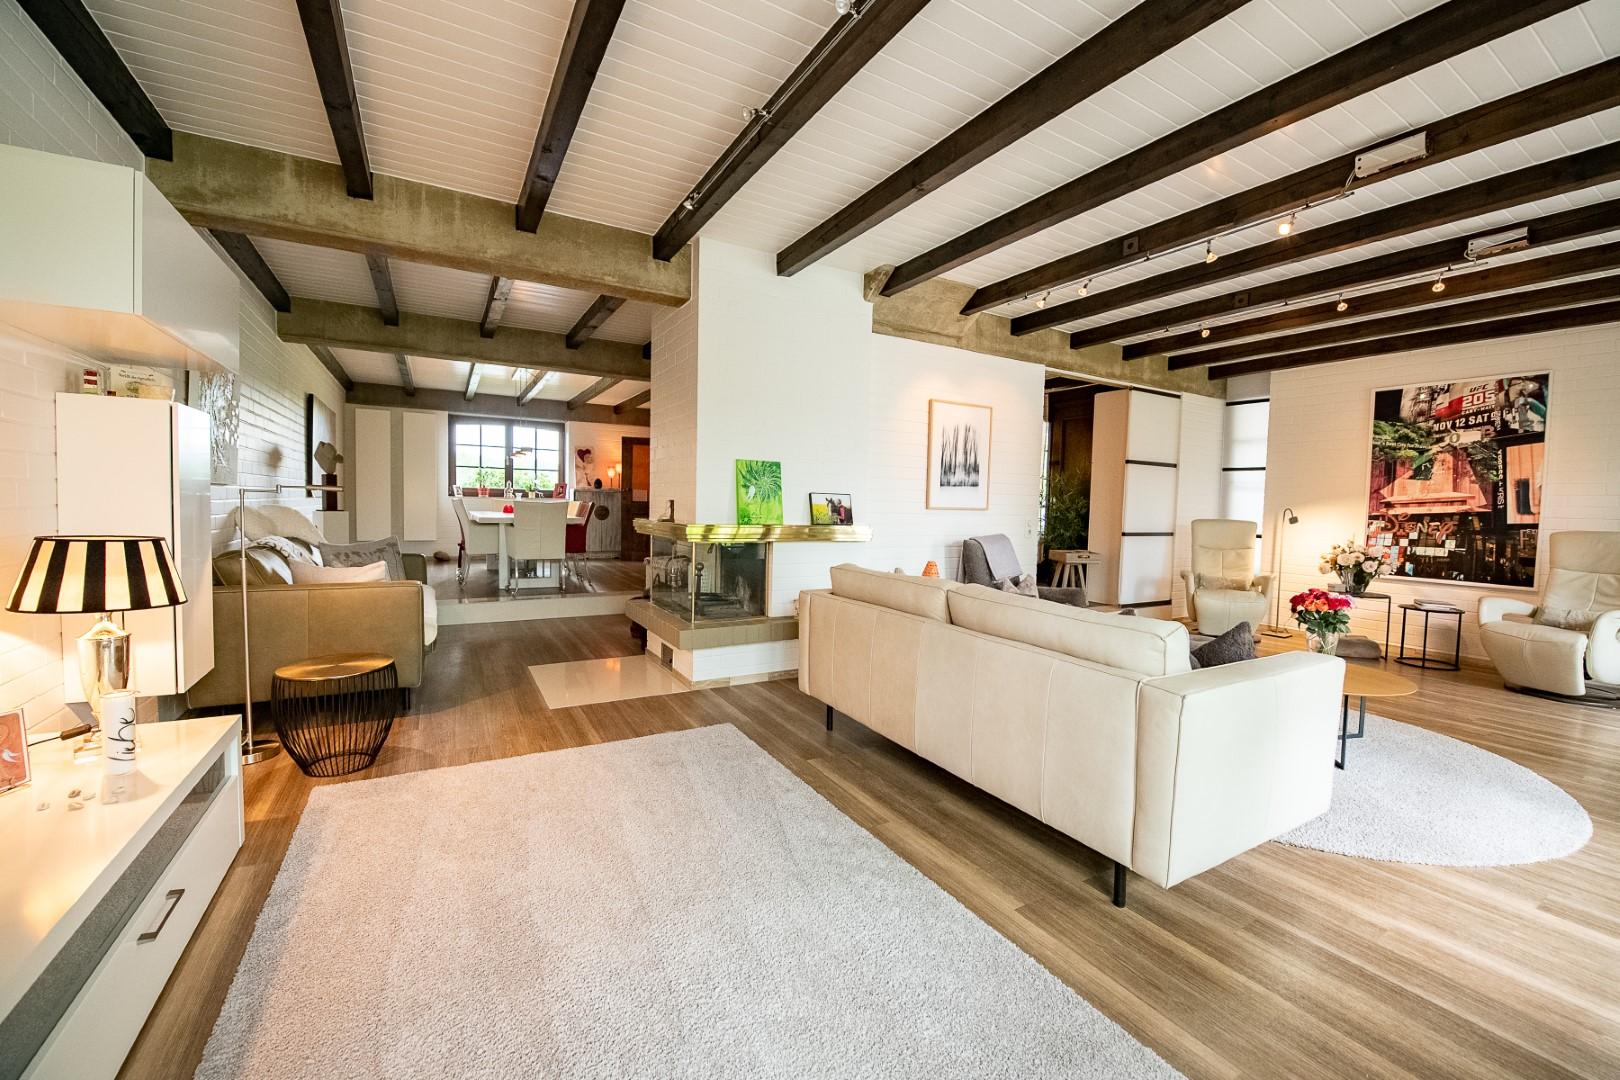 Immobilie Nr.0356   , 40670 Meerbusch - Osterath